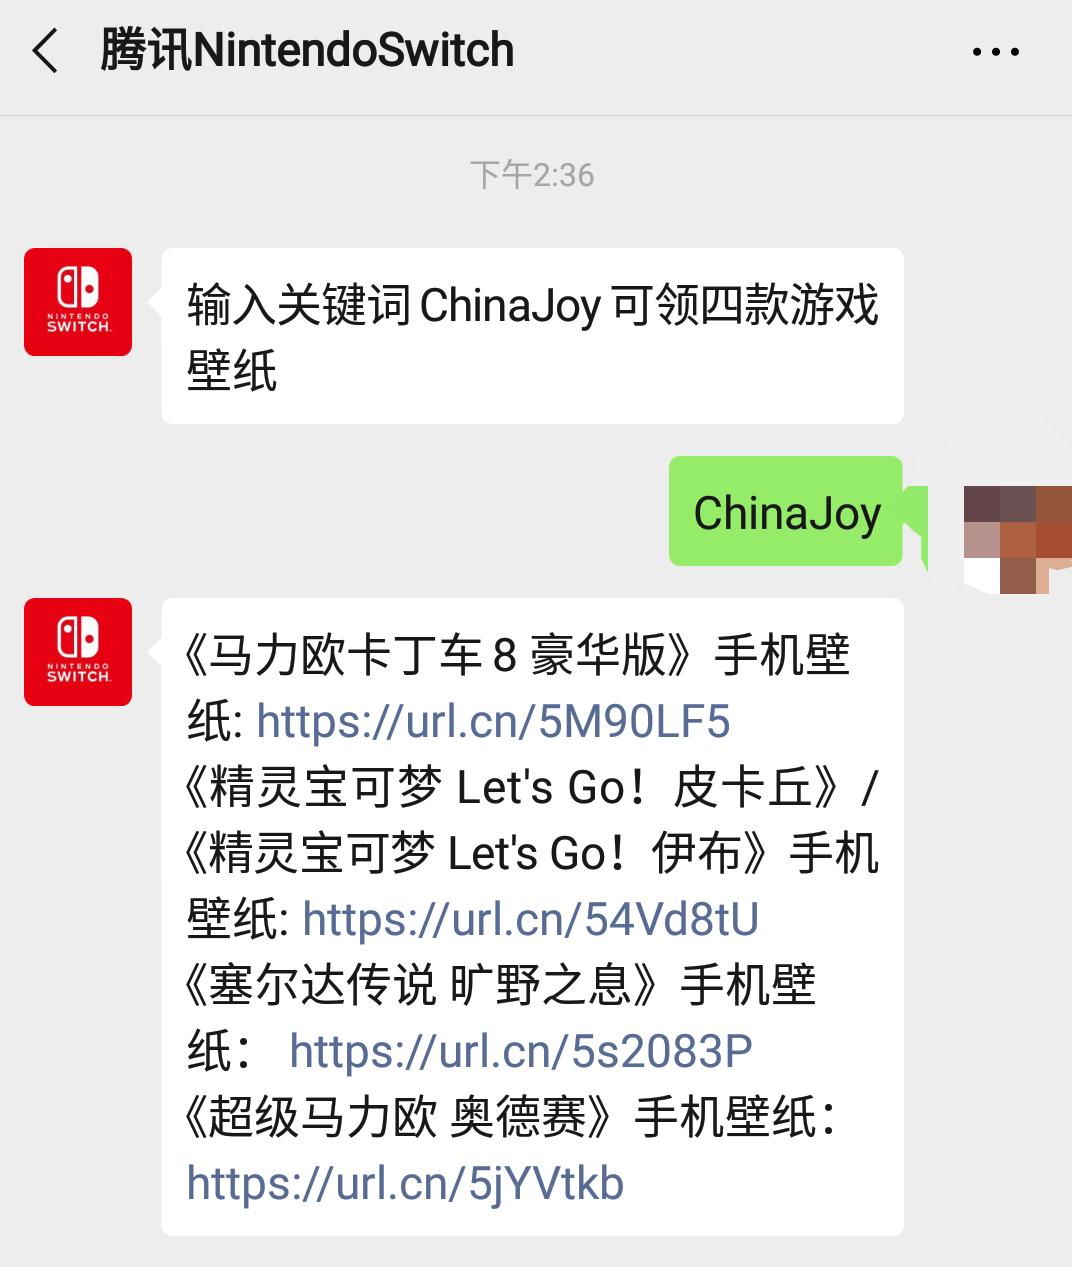 <b>腾讯Nintendo展会即将开始 官方发布中文游戏壁纸</b>